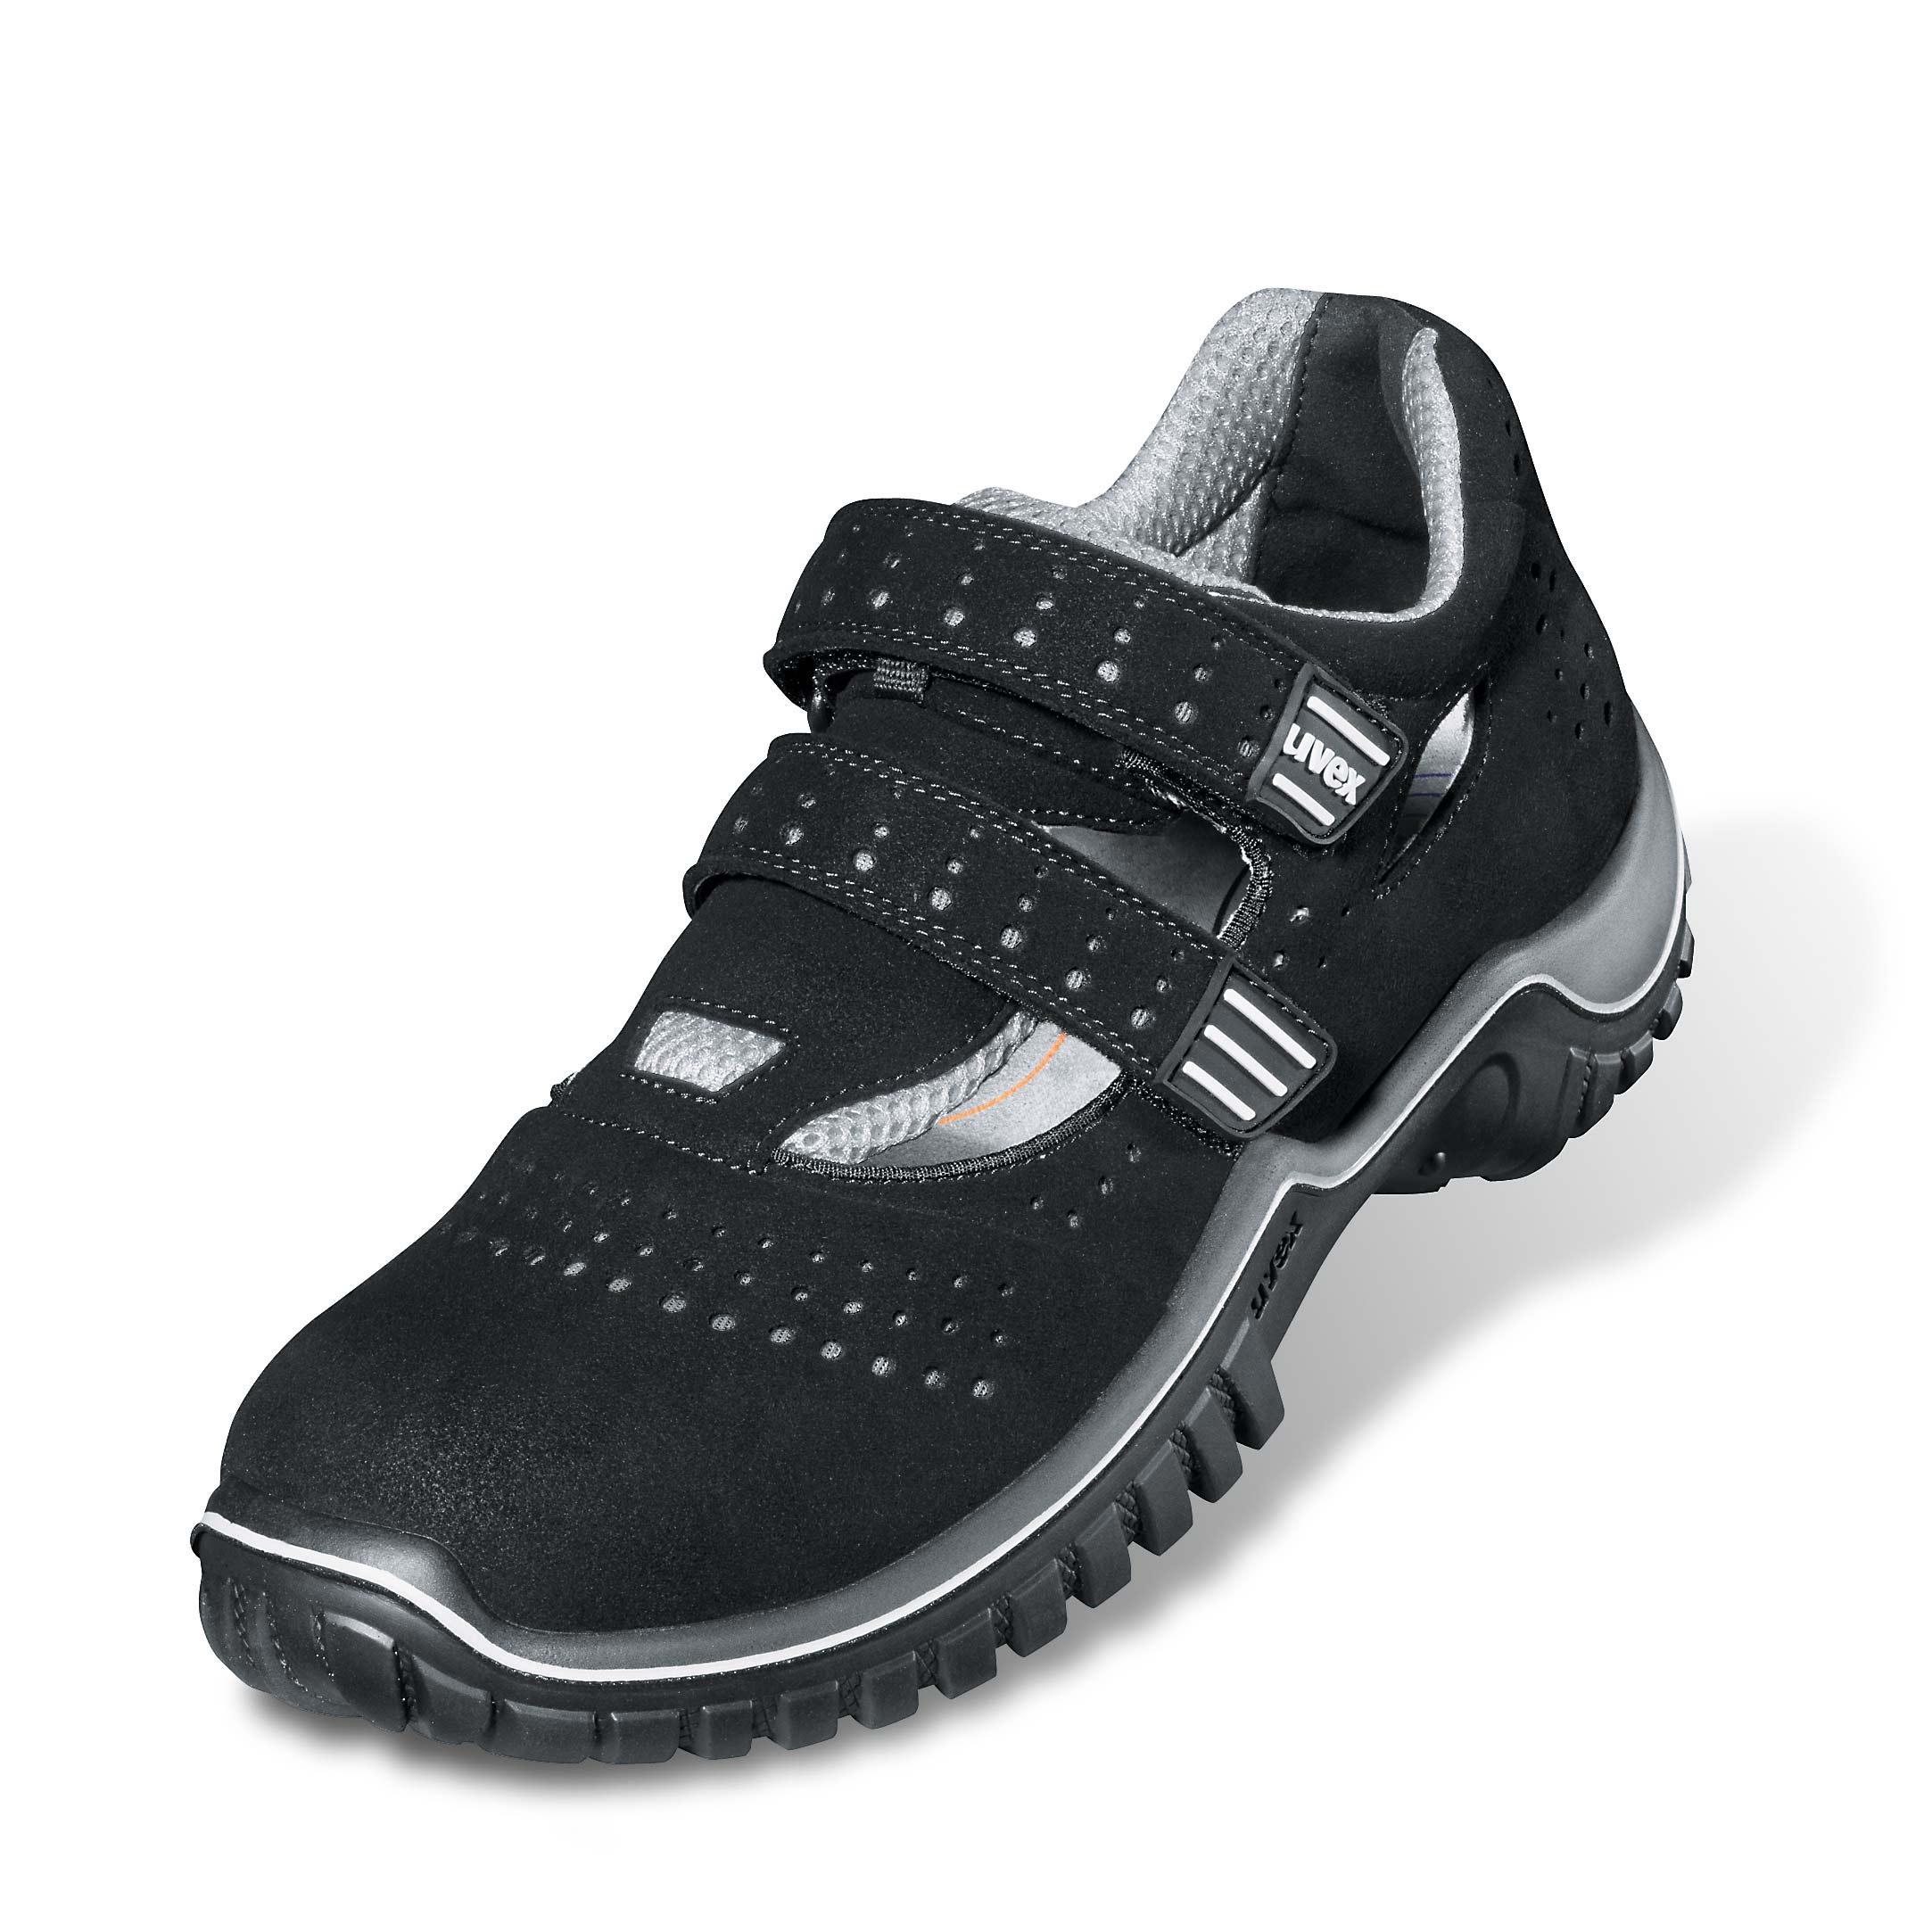 sandale uvex motion style s1 src sicherheitsschuhe uvex safety. Black Bedroom Furniture Sets. Home Design Ideas